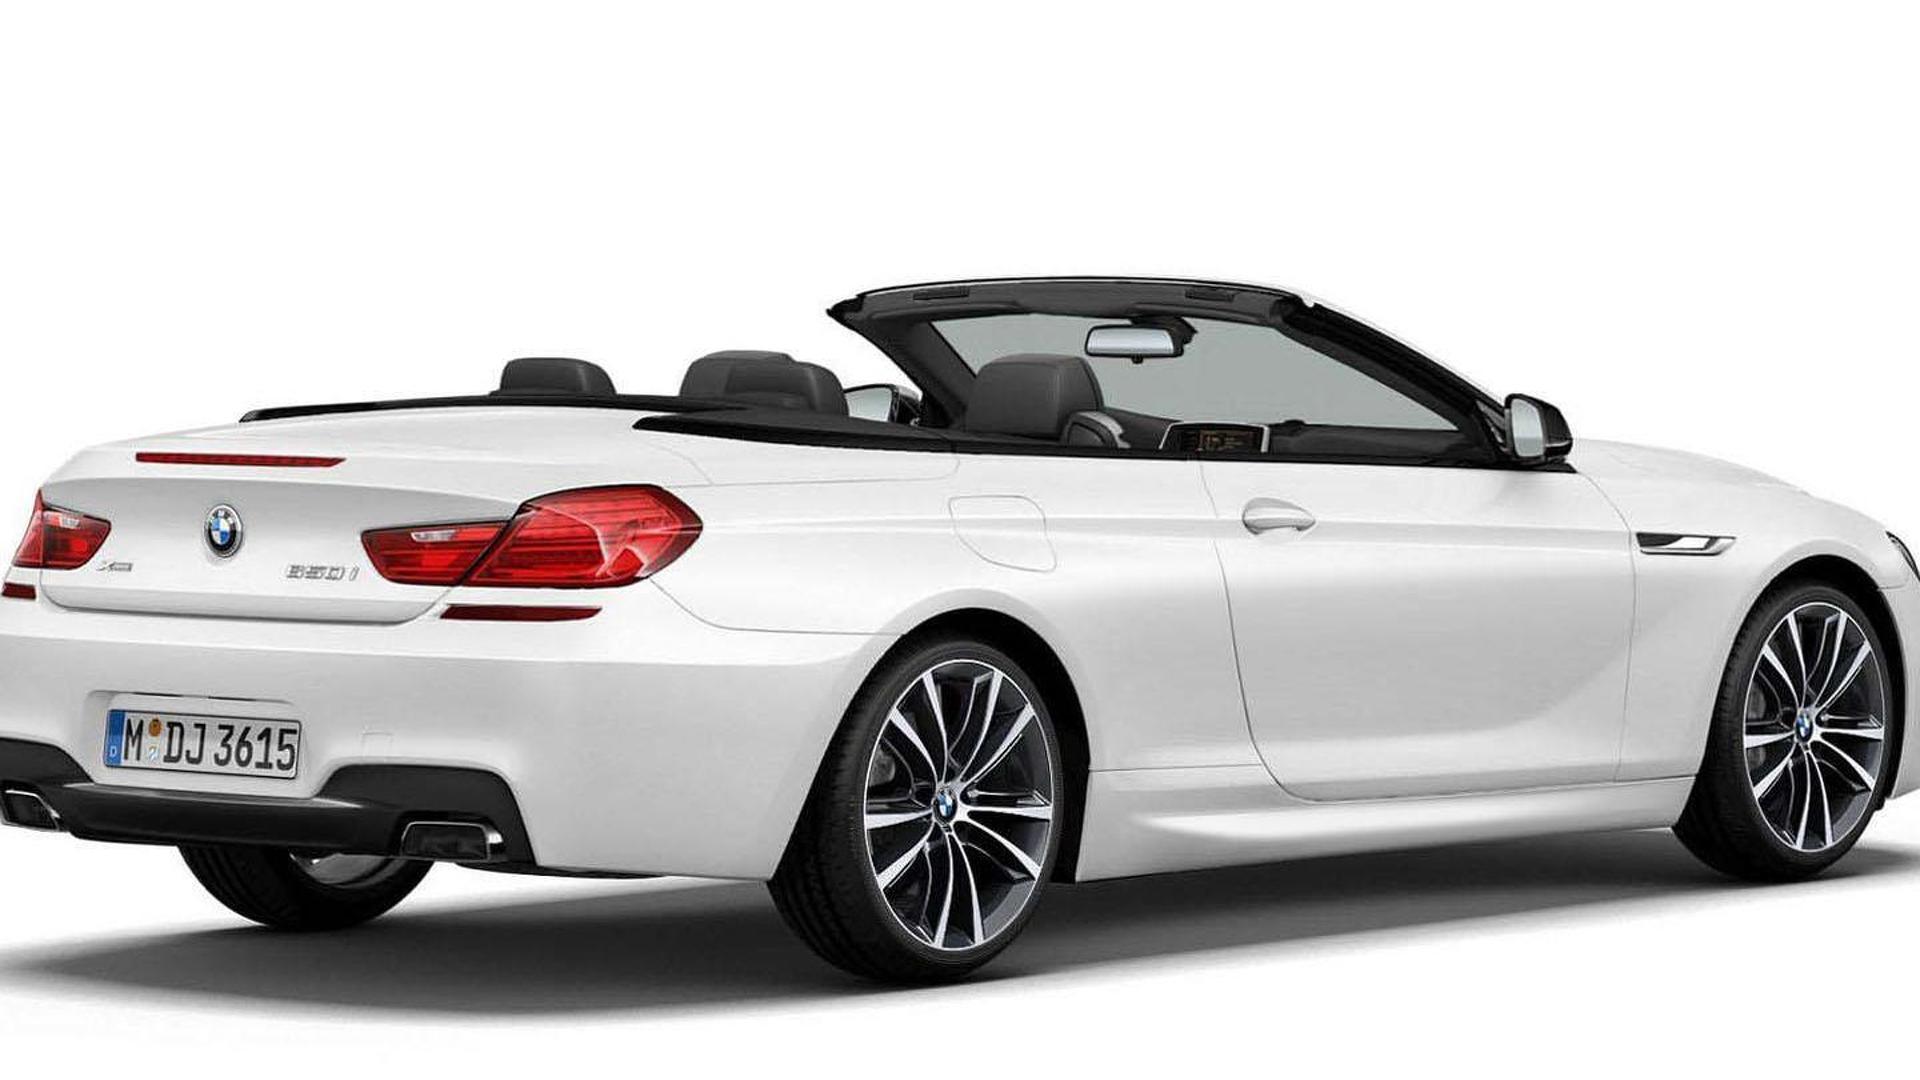 BMW Series Convertible Frozen Brilliant White Edition - Bmw 6 series convertible white